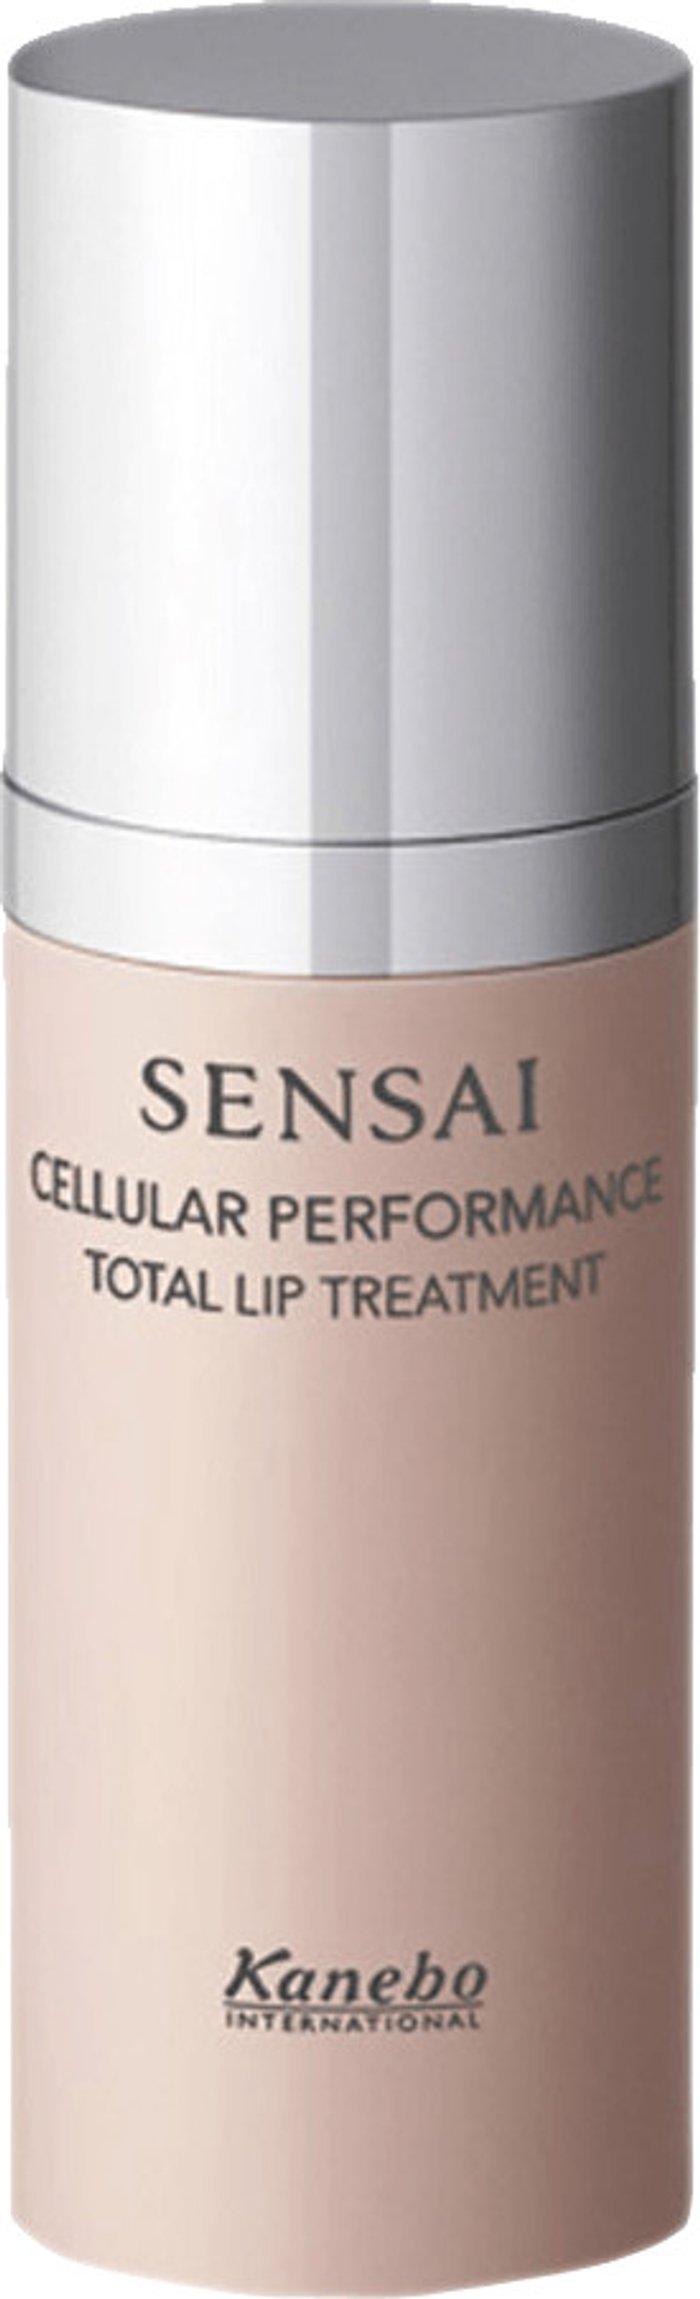 Kanebo Kanebo Sensai Cellular Lip Treatment (15ml)